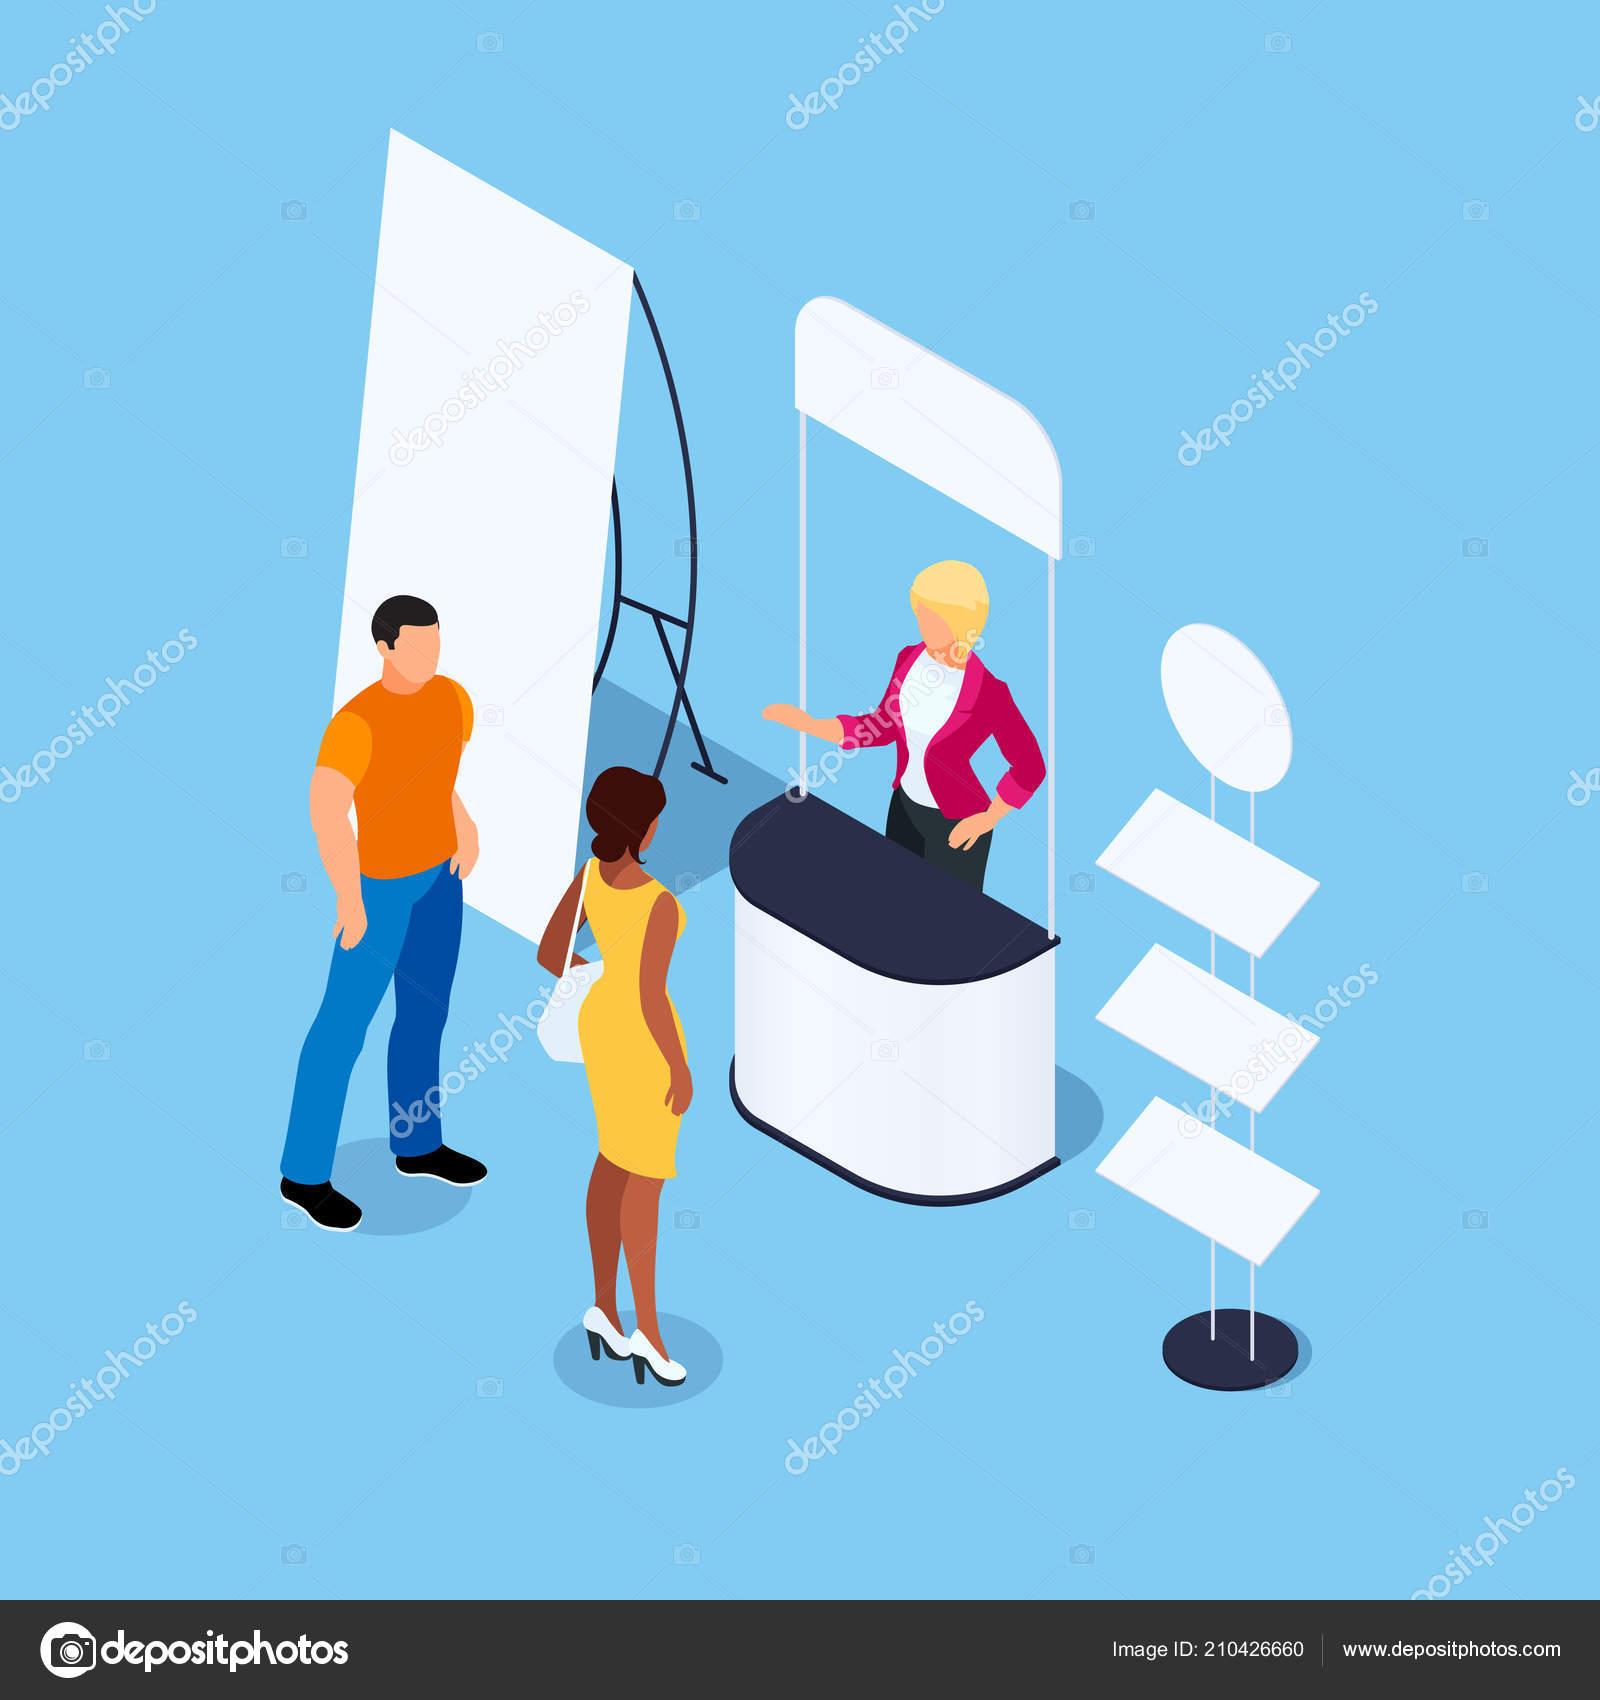 9e2c4bed8203 Ισομετρική διαφημιστικό stand με υποκινητή και τους πελάτες. Περίπτερο με  διαφημιστικές αφίσες και rack για το προϊόν. Κενό κοροϊδεύω.